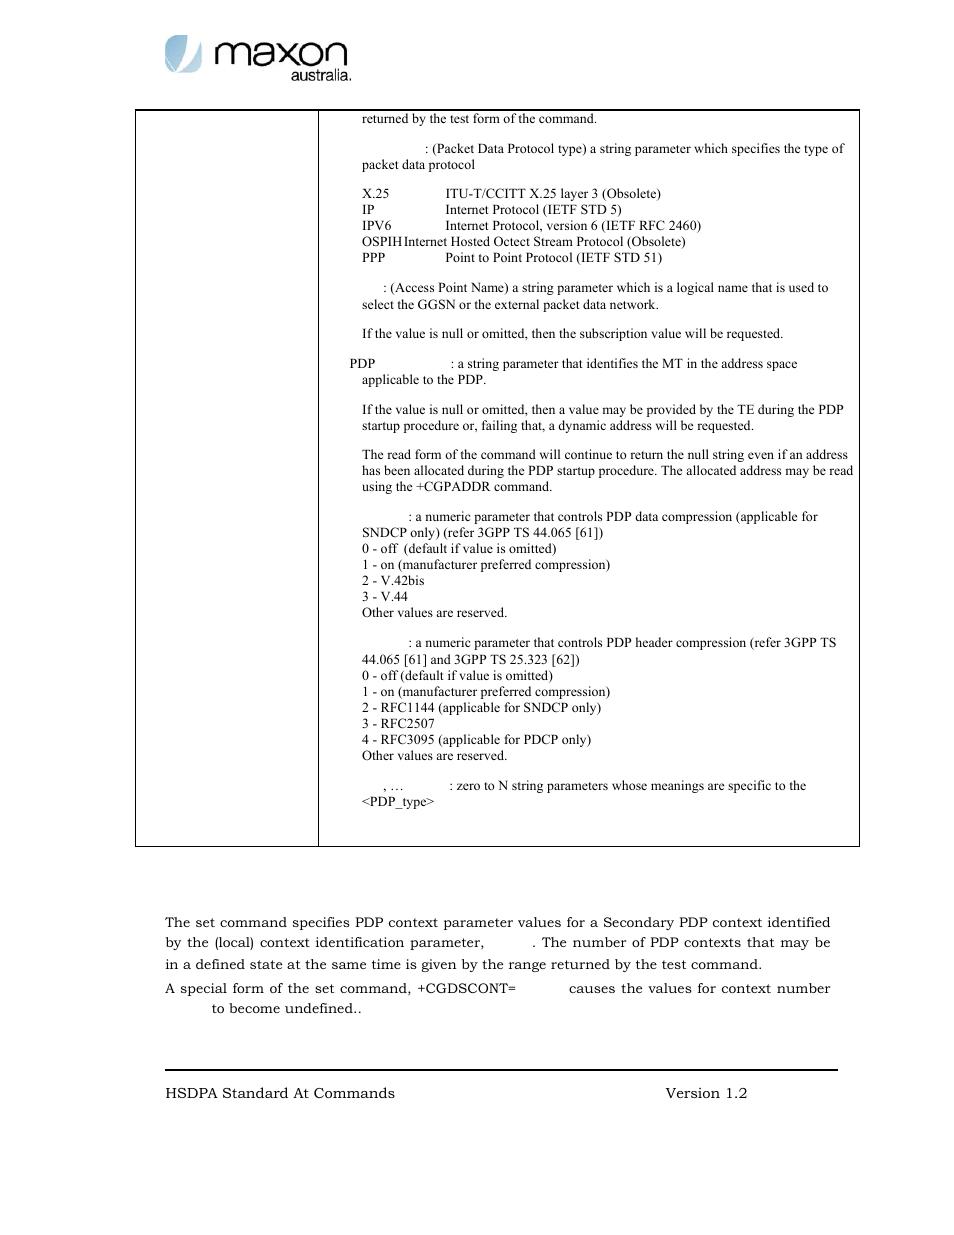 Maxon Manual 3 Way Switch Wiring Diagram Installation Rc 2b 3b 4b 5b Array Define Secondary Pdp Context Cgdscont Telecom Modmax Mm Rh Manualsdir Com